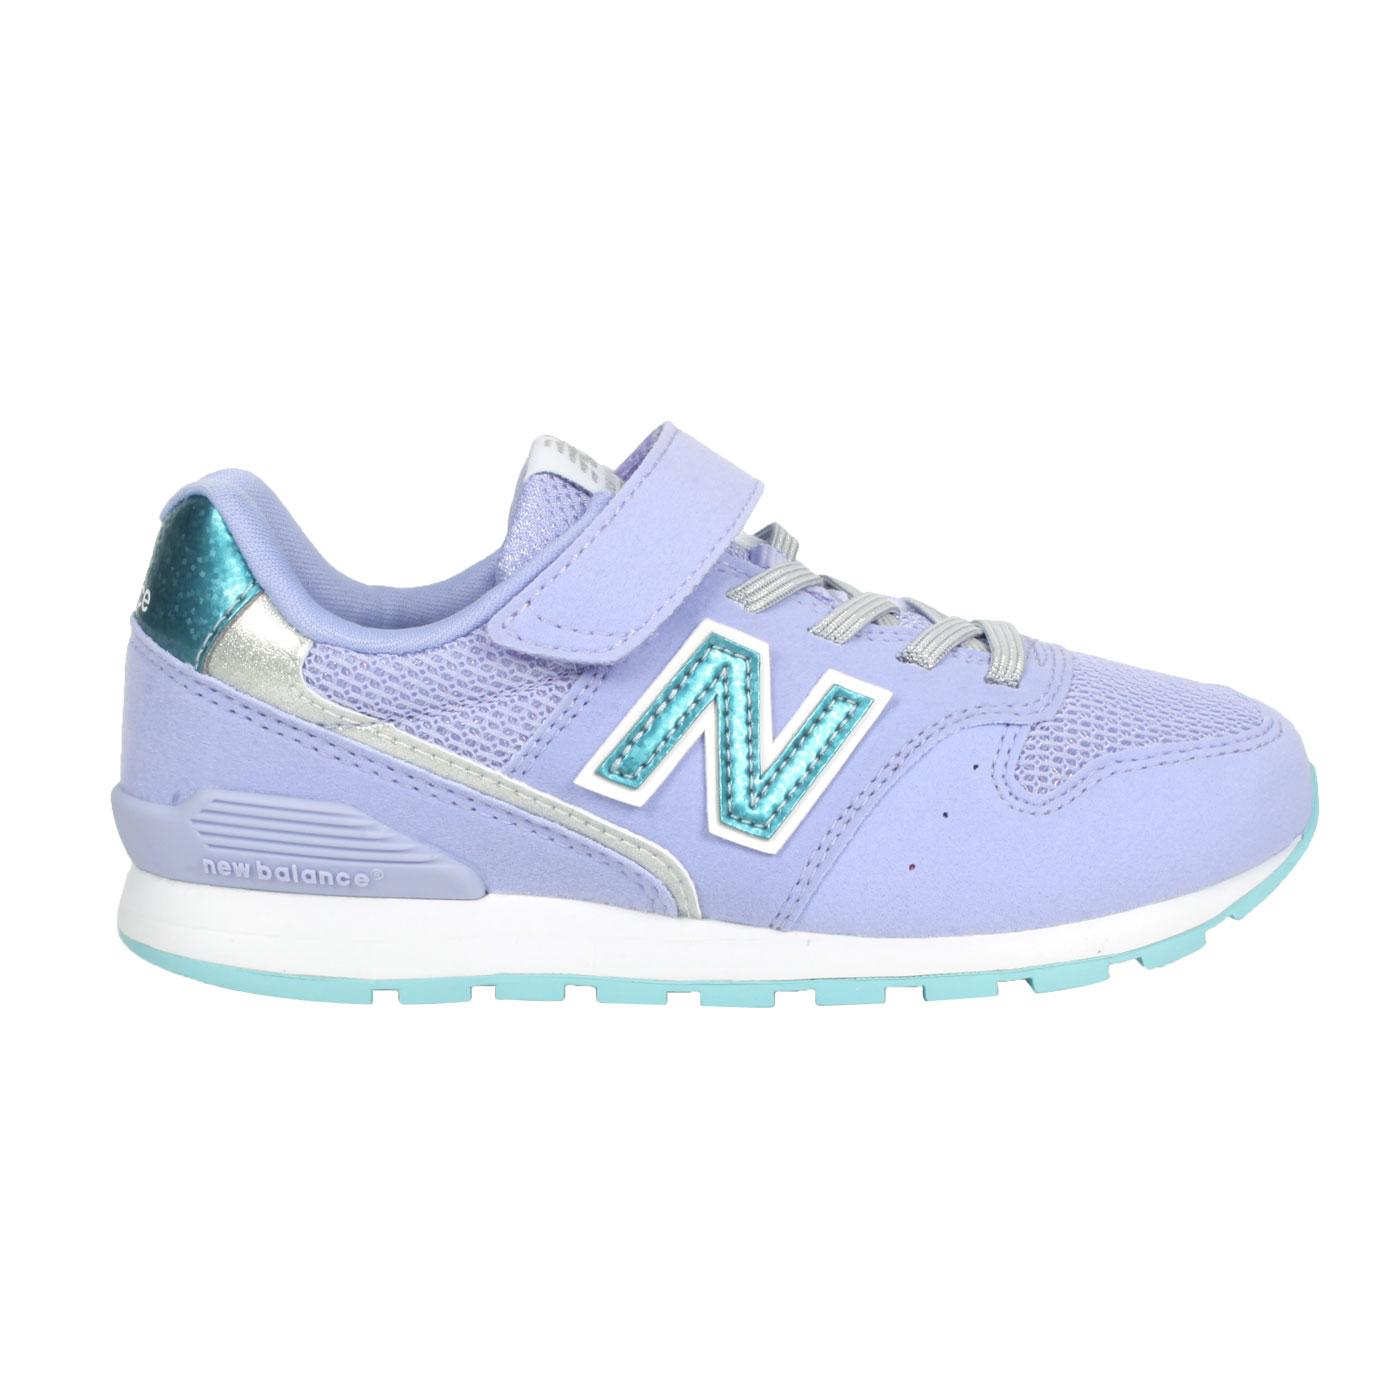 NEW BALANCE 中童休閒運動鞋-WIDE YV996ULV - 紫藍